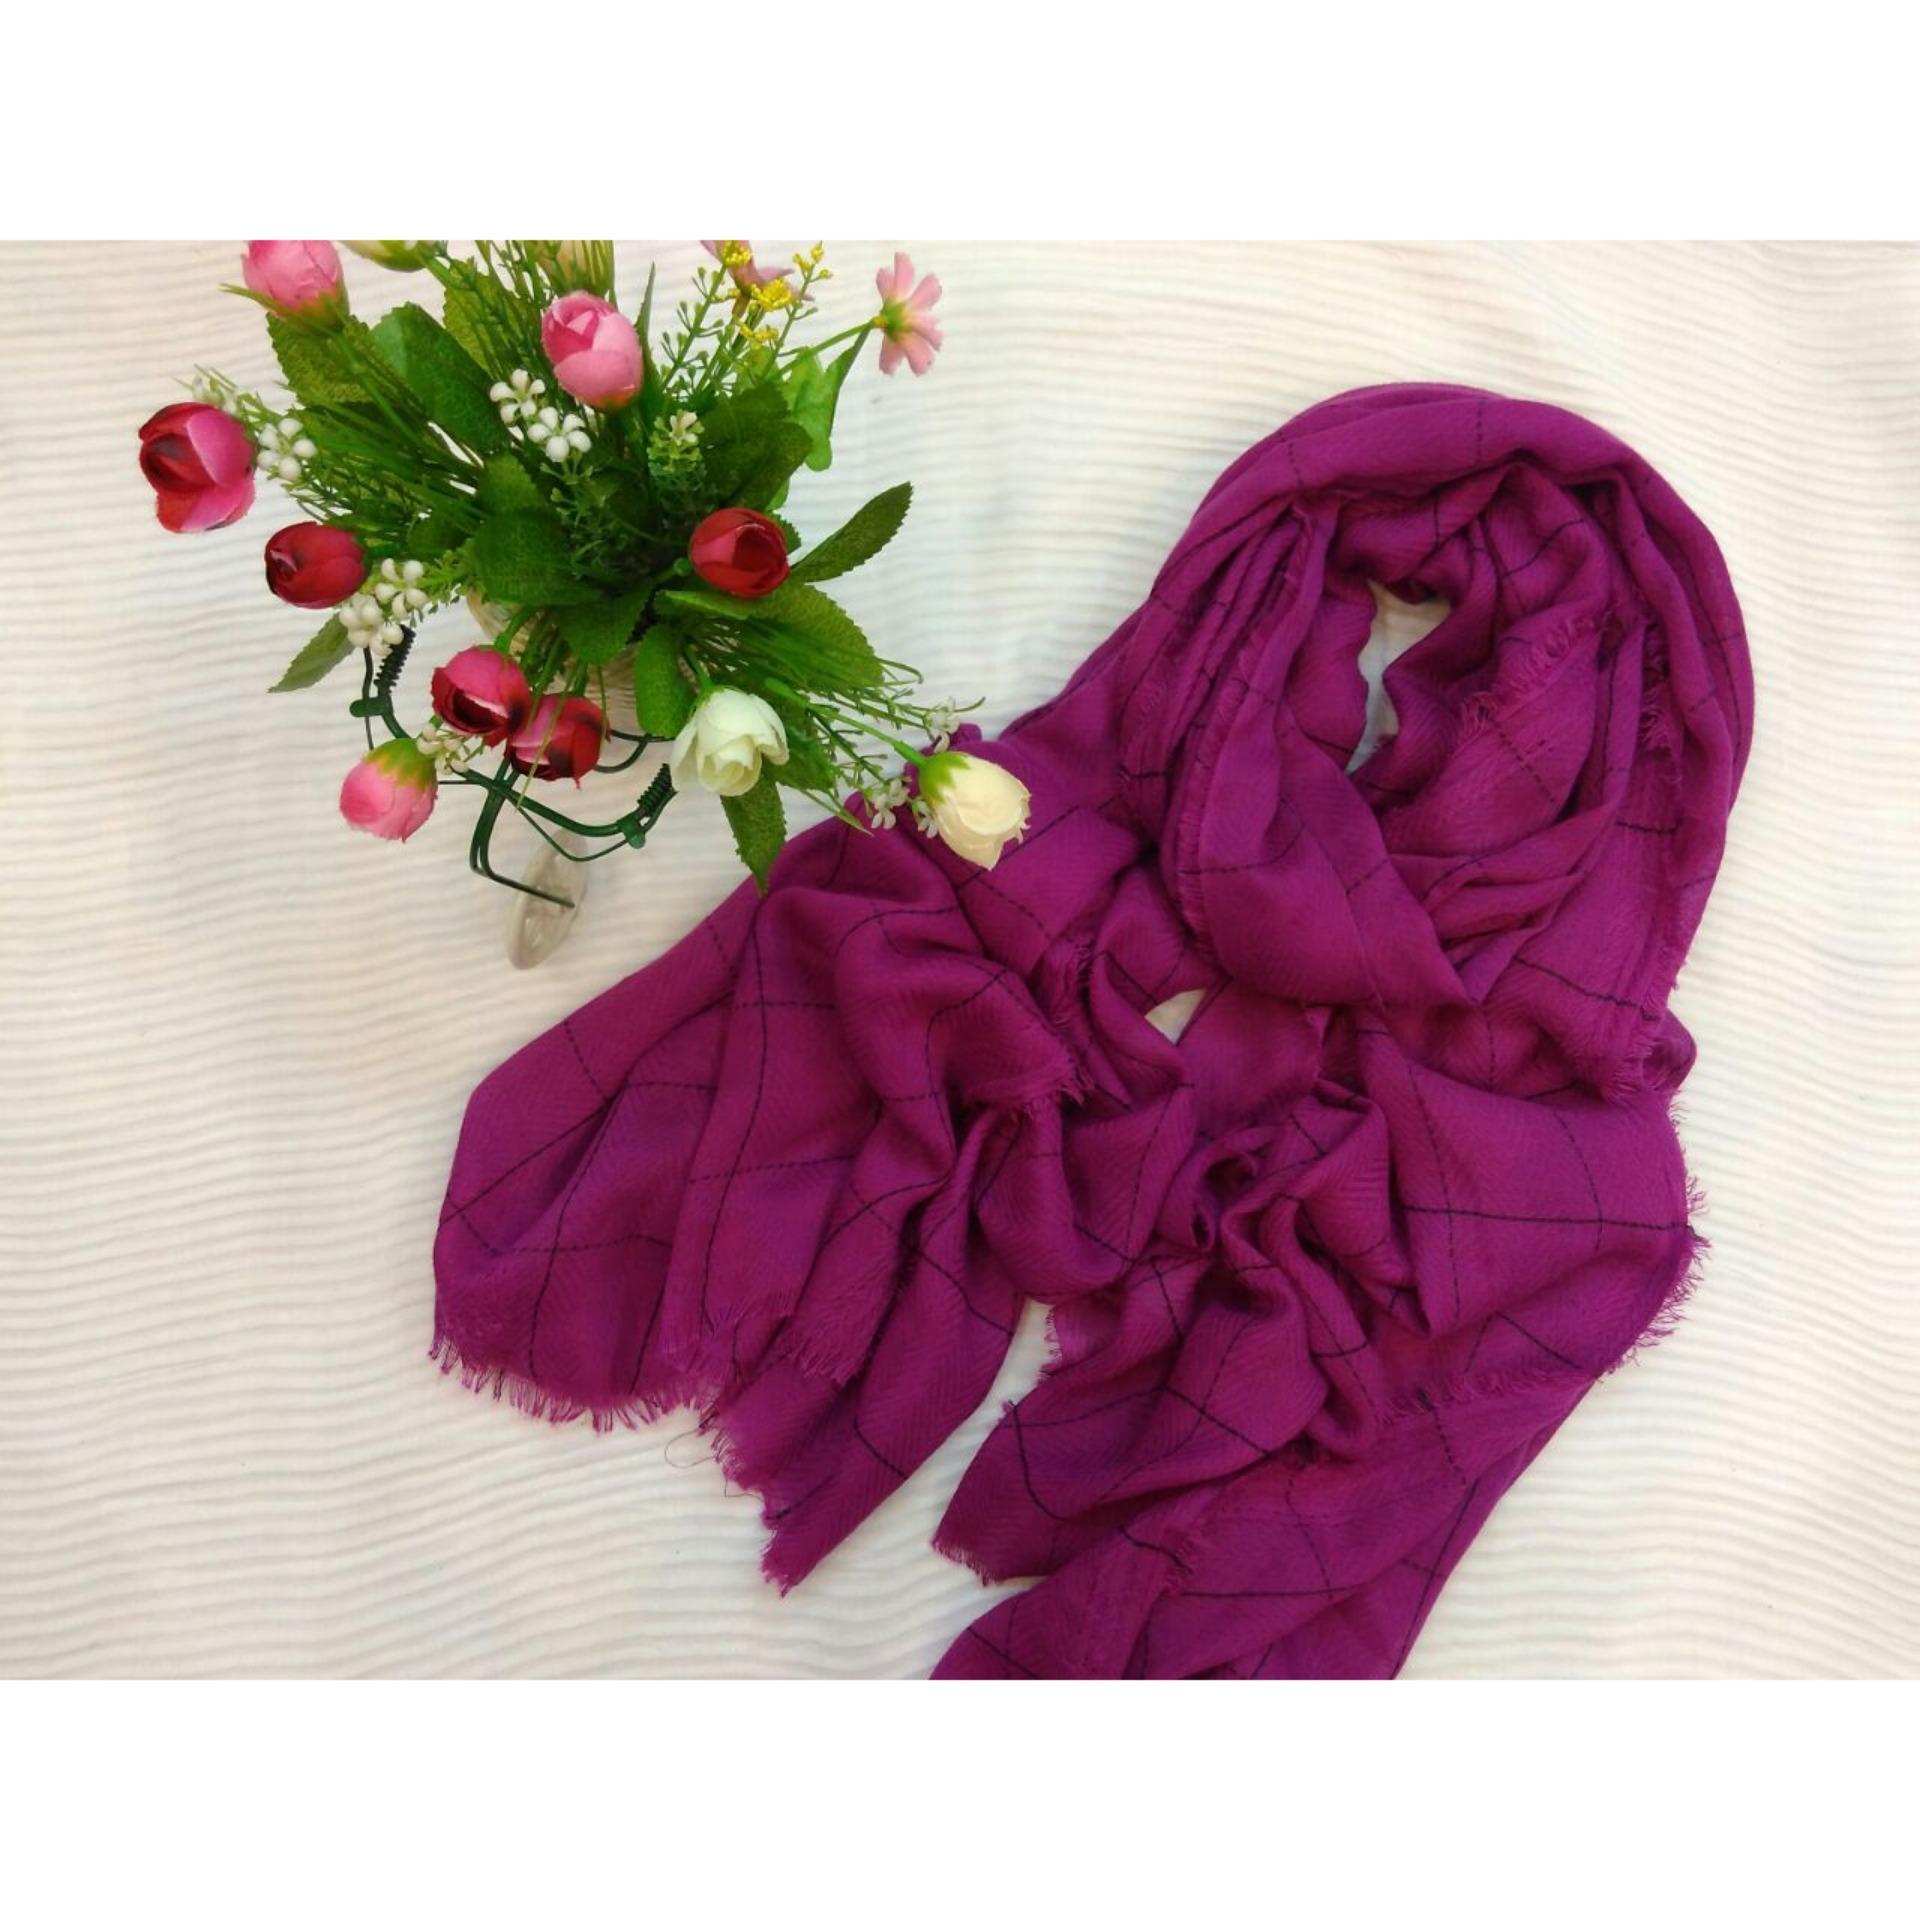 Pencarian Termurah Jilbab Murah Hijab Style Fashion Vanilla Instan Najwa Kaos Katun Tc Premium Biru Cantik Simple Store Terbaru